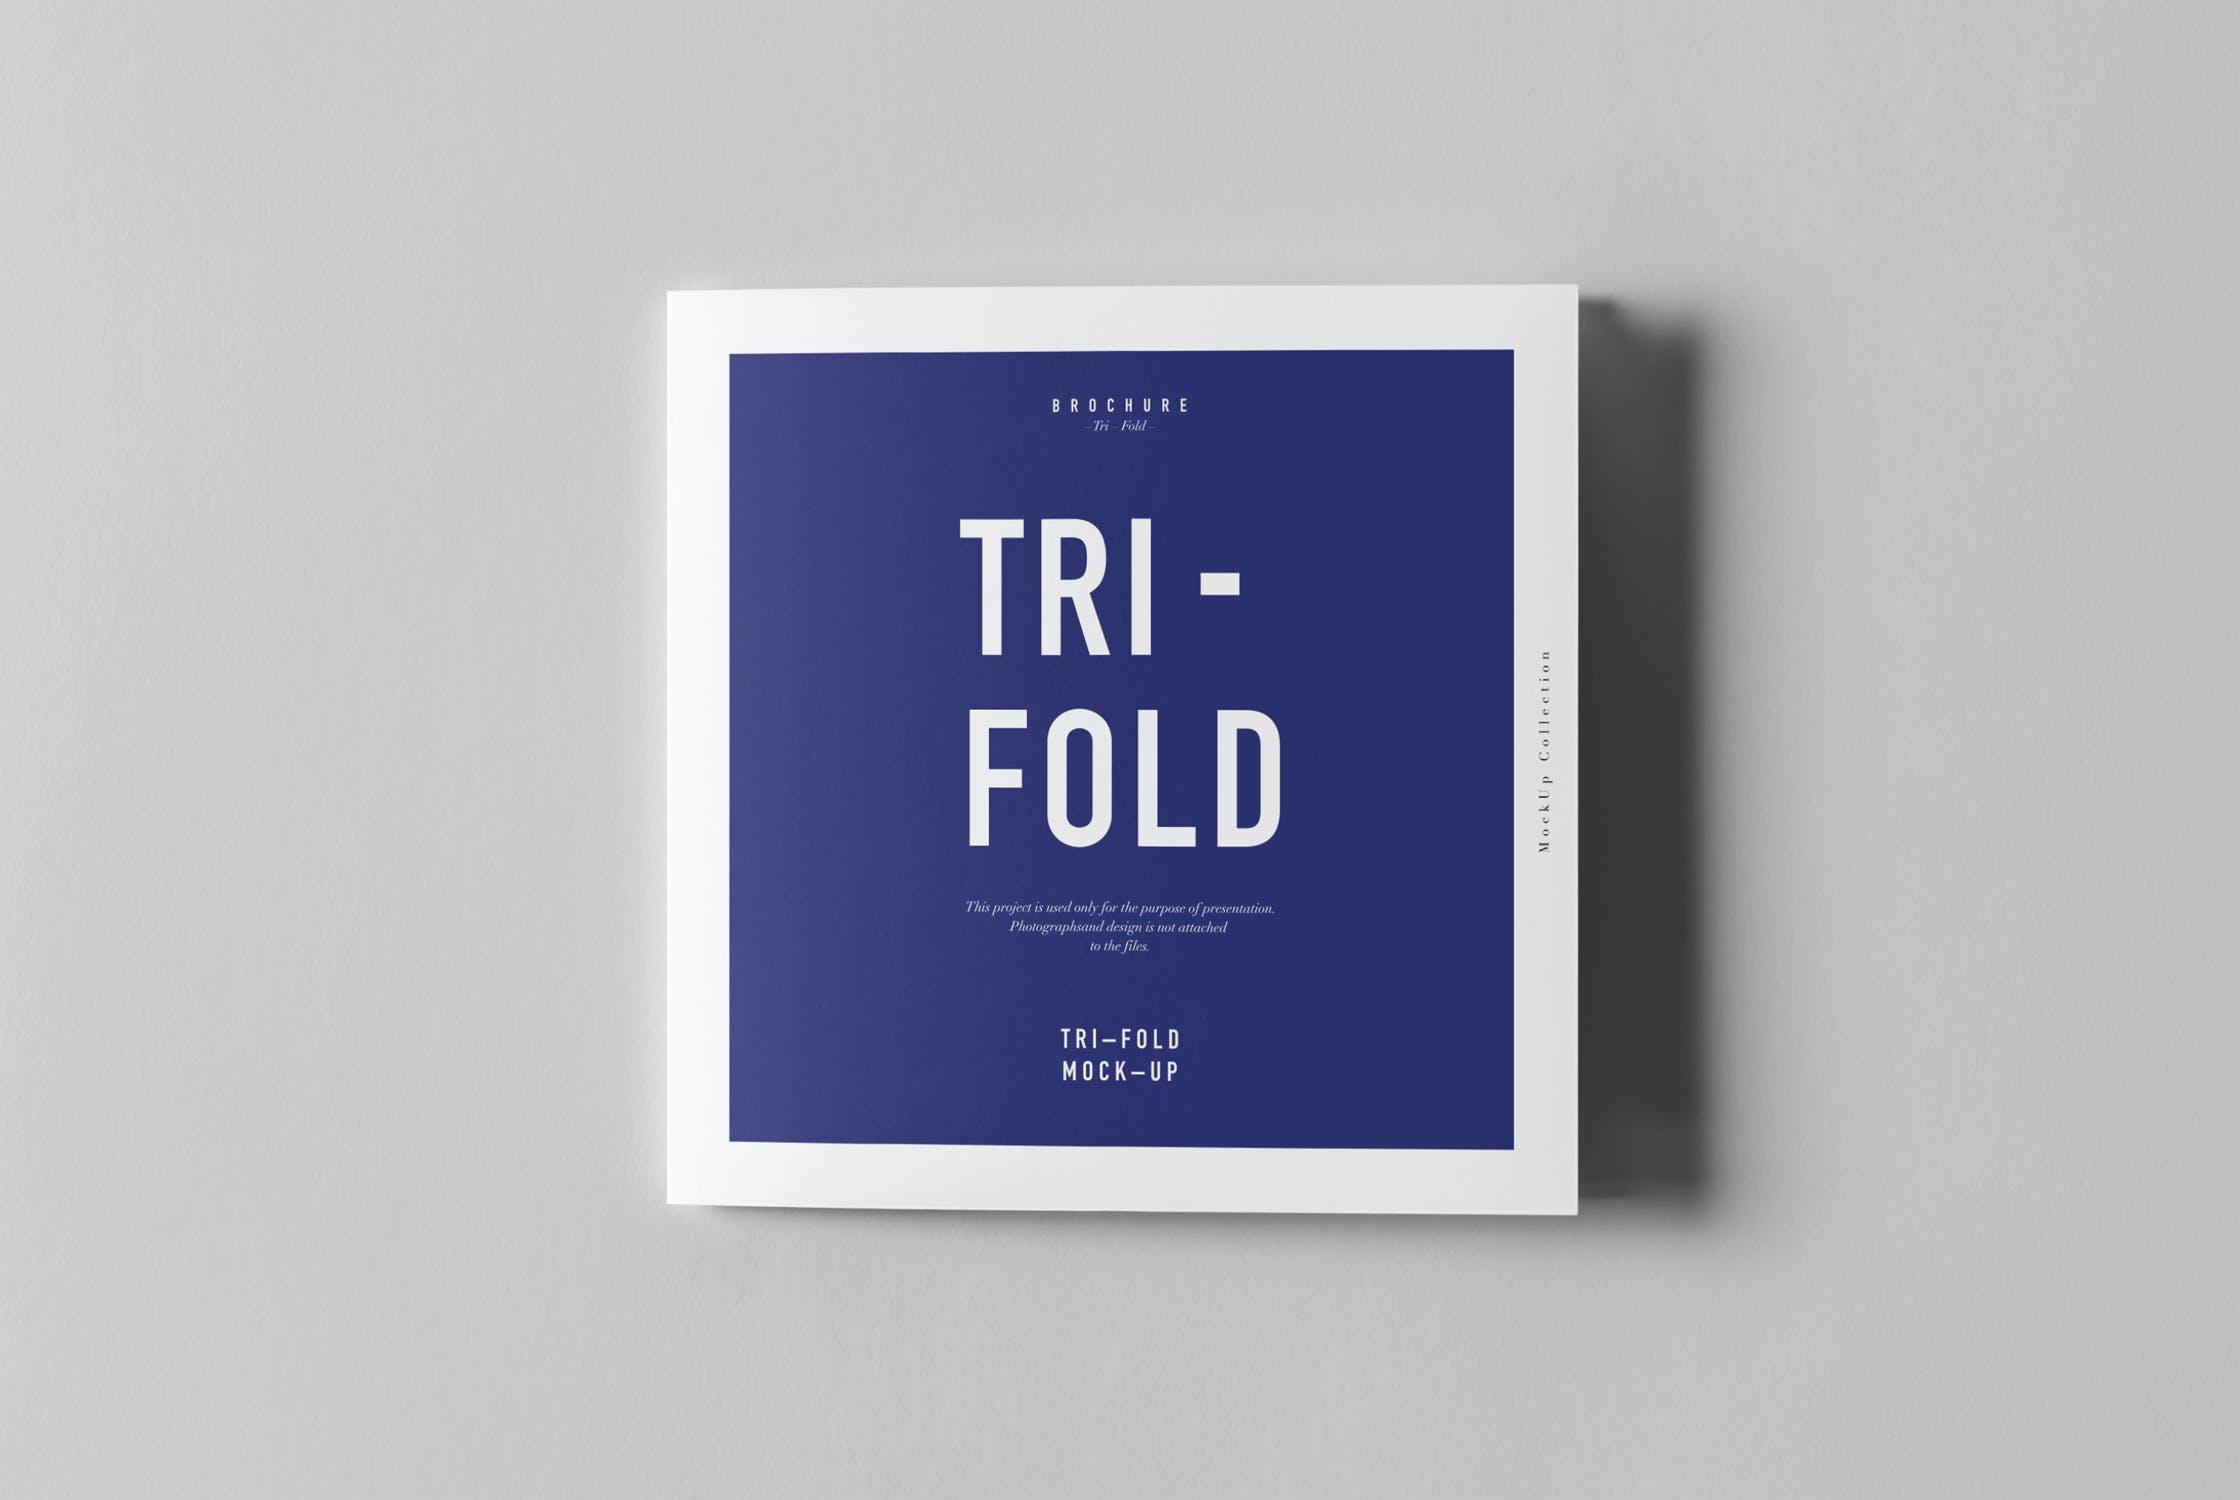 8款三折页小册子设计展示样机模板 Tri-Fold Square Brochure Mockup插图(7)